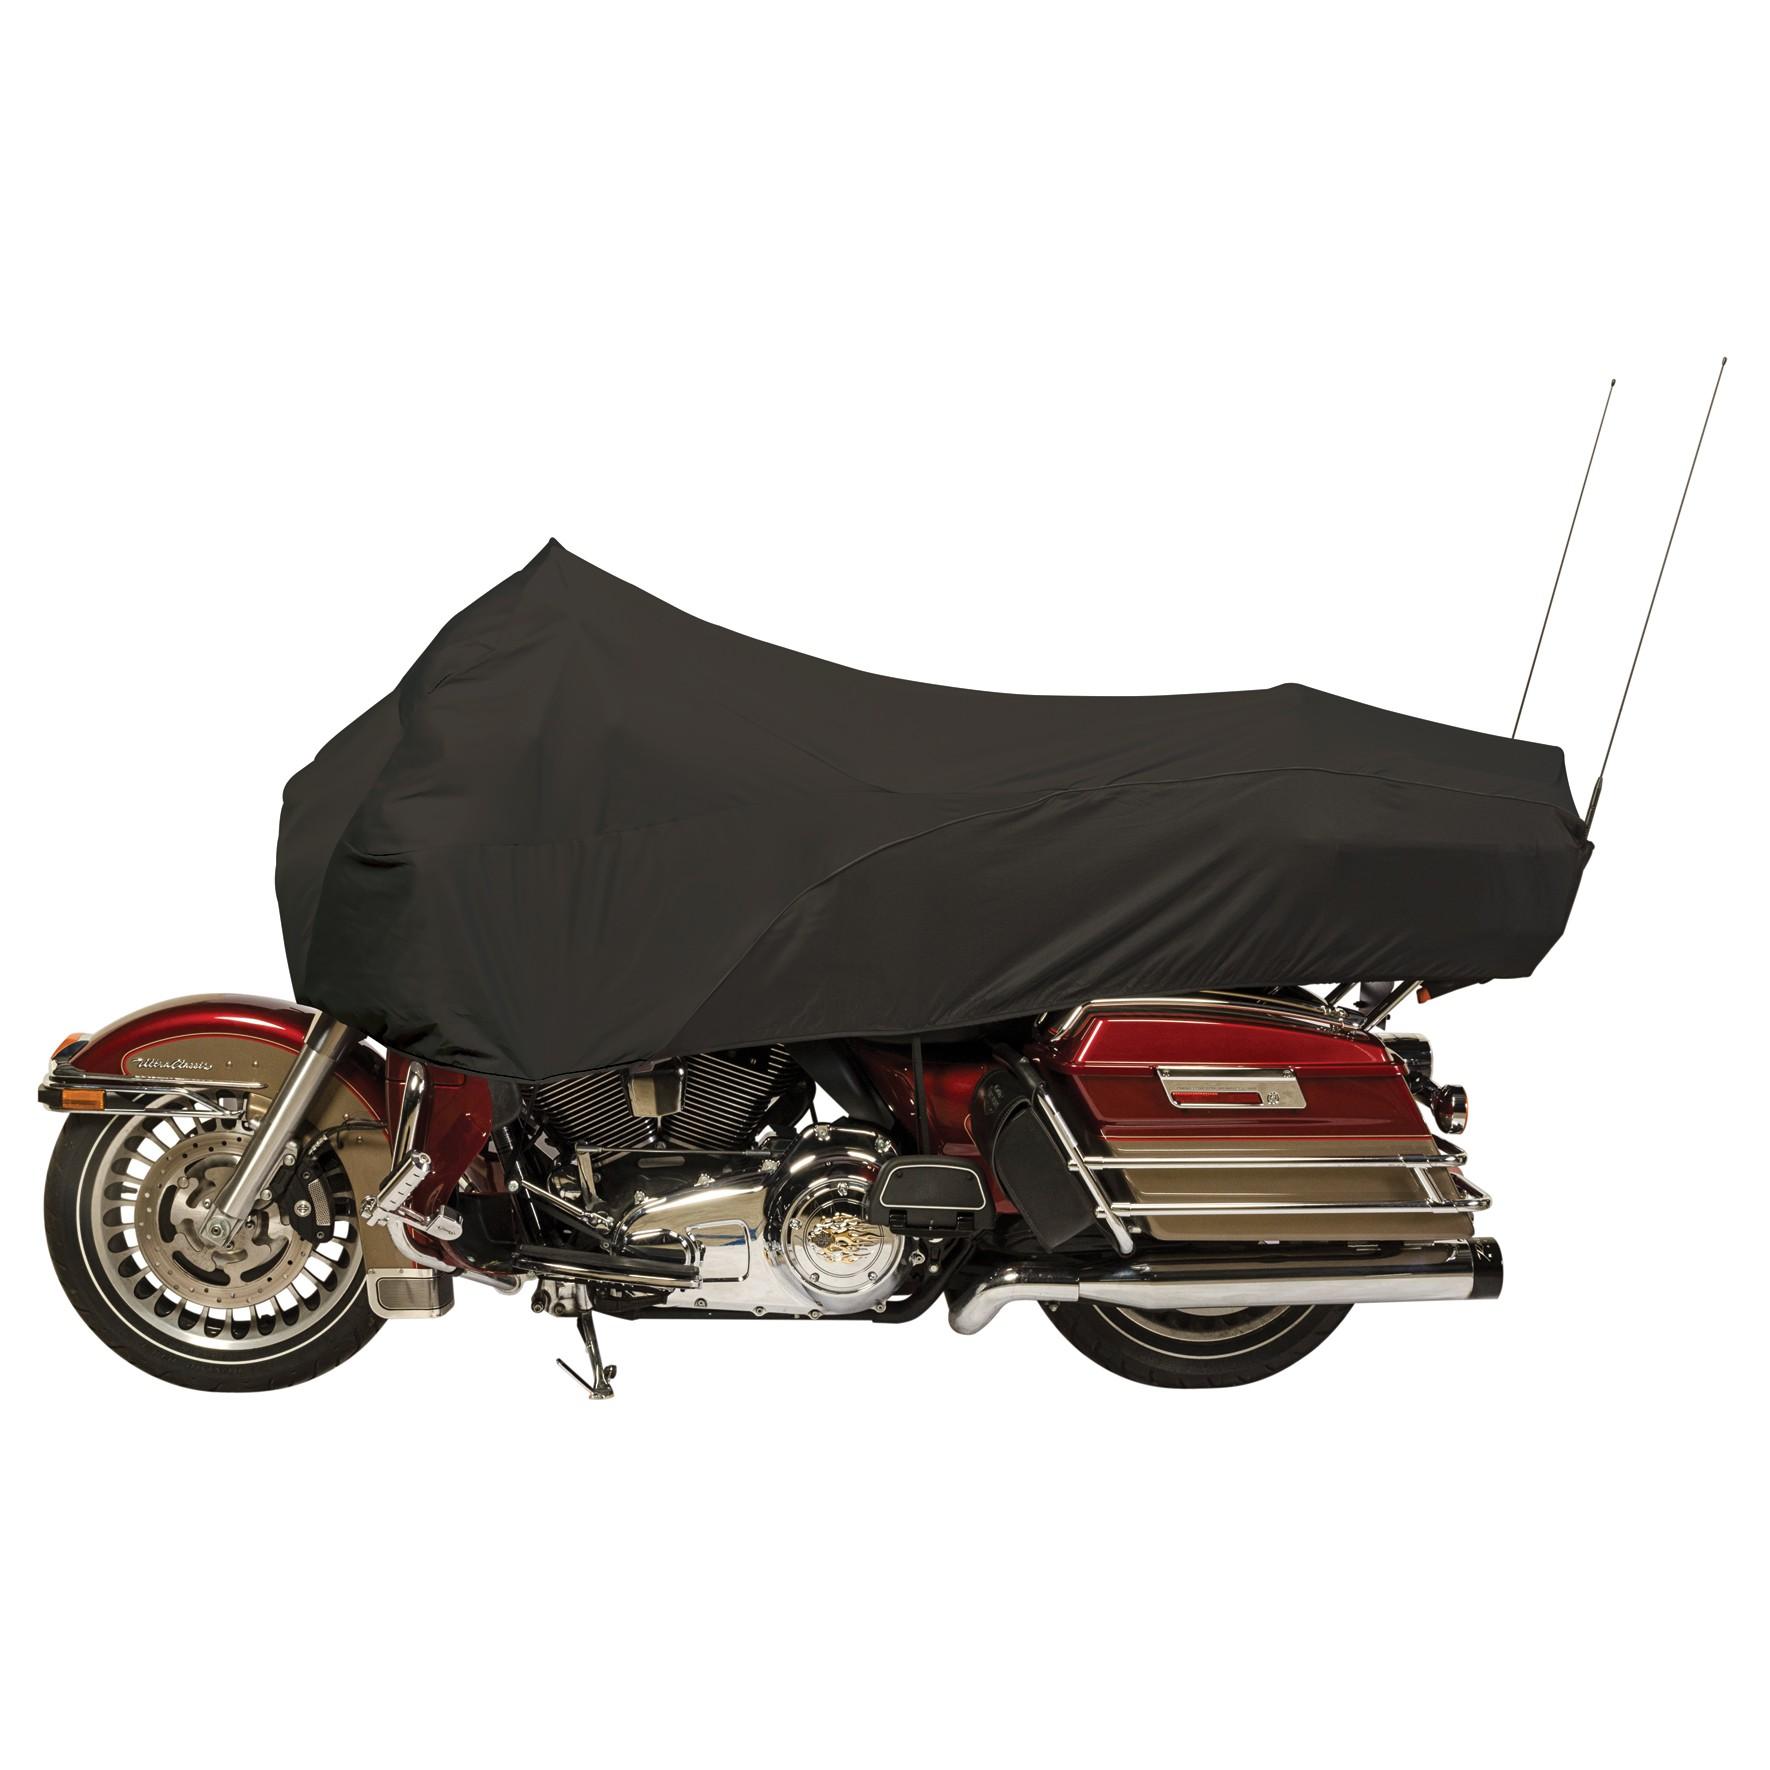 Dowco Guardian Premium Half Cover on a Harley-Davidson Ultra Classic